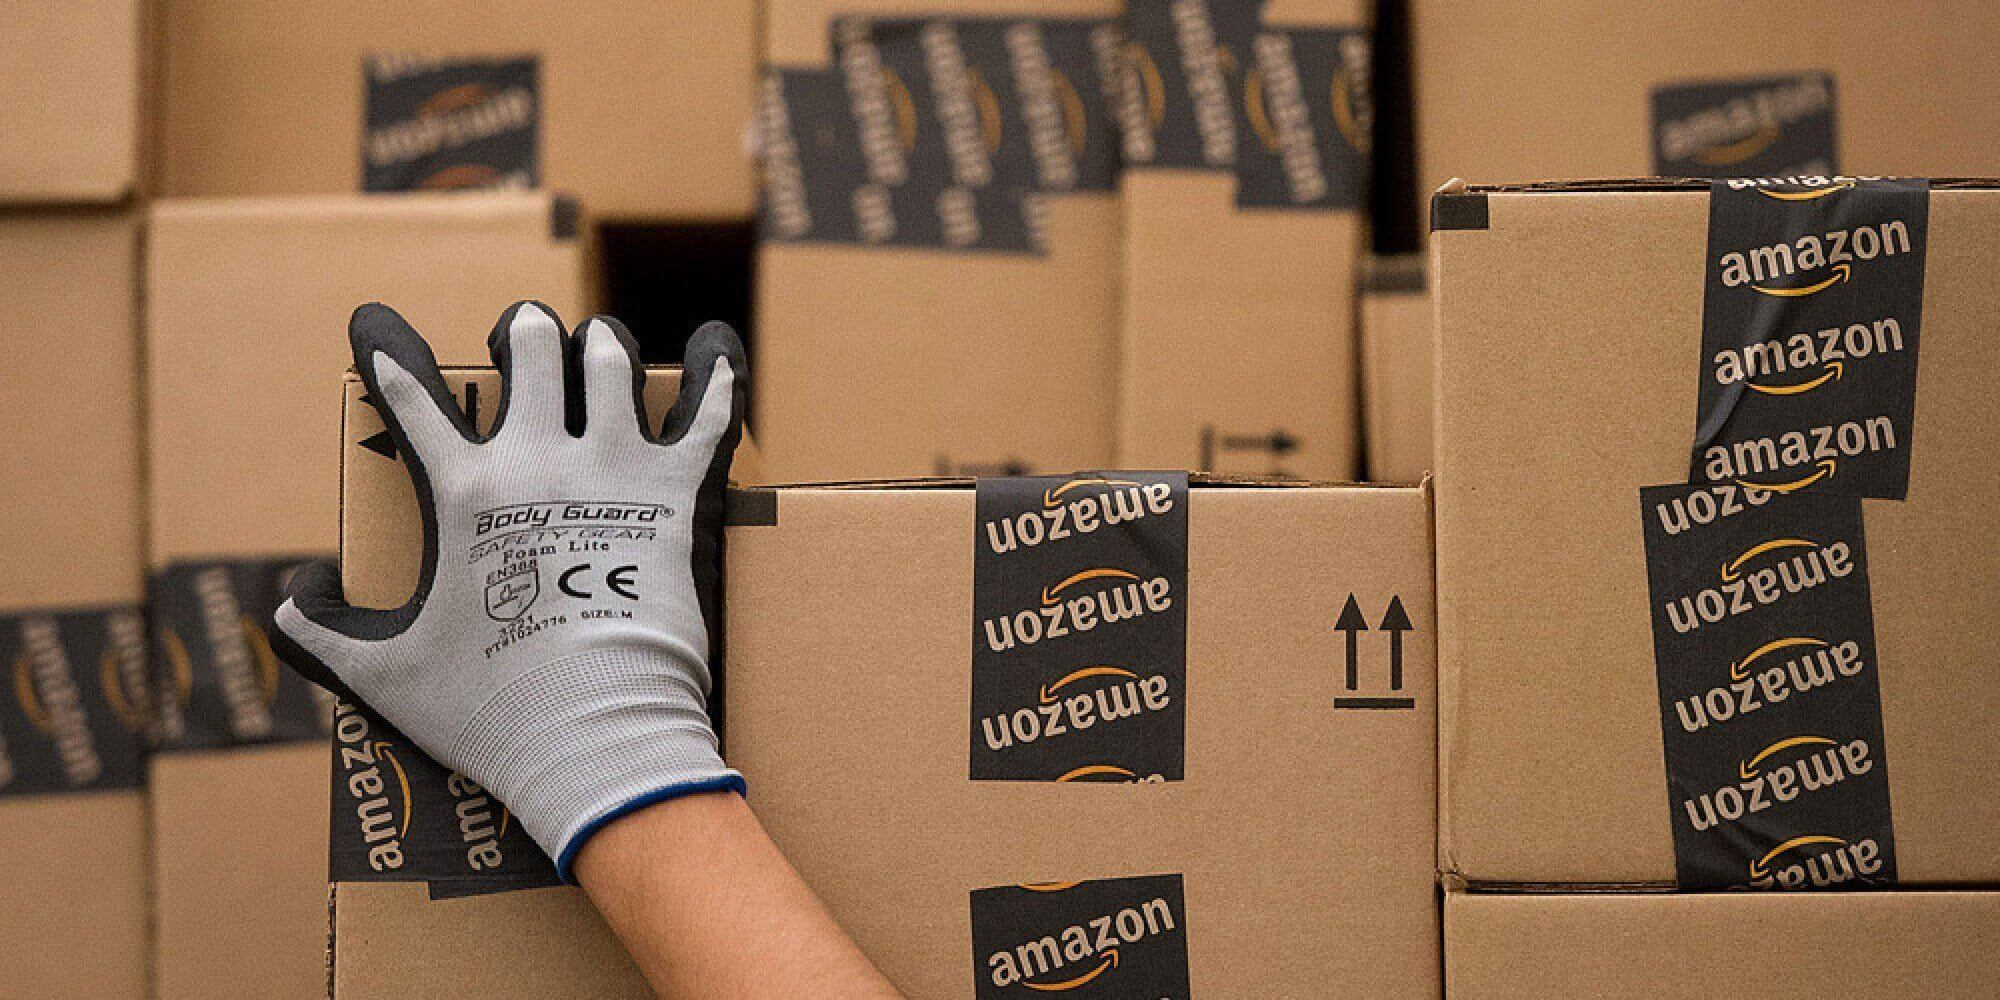 o AMAZON DELIVERY facebook - Amazon brasileira venderá eletrônicos em breve, afirma jornal